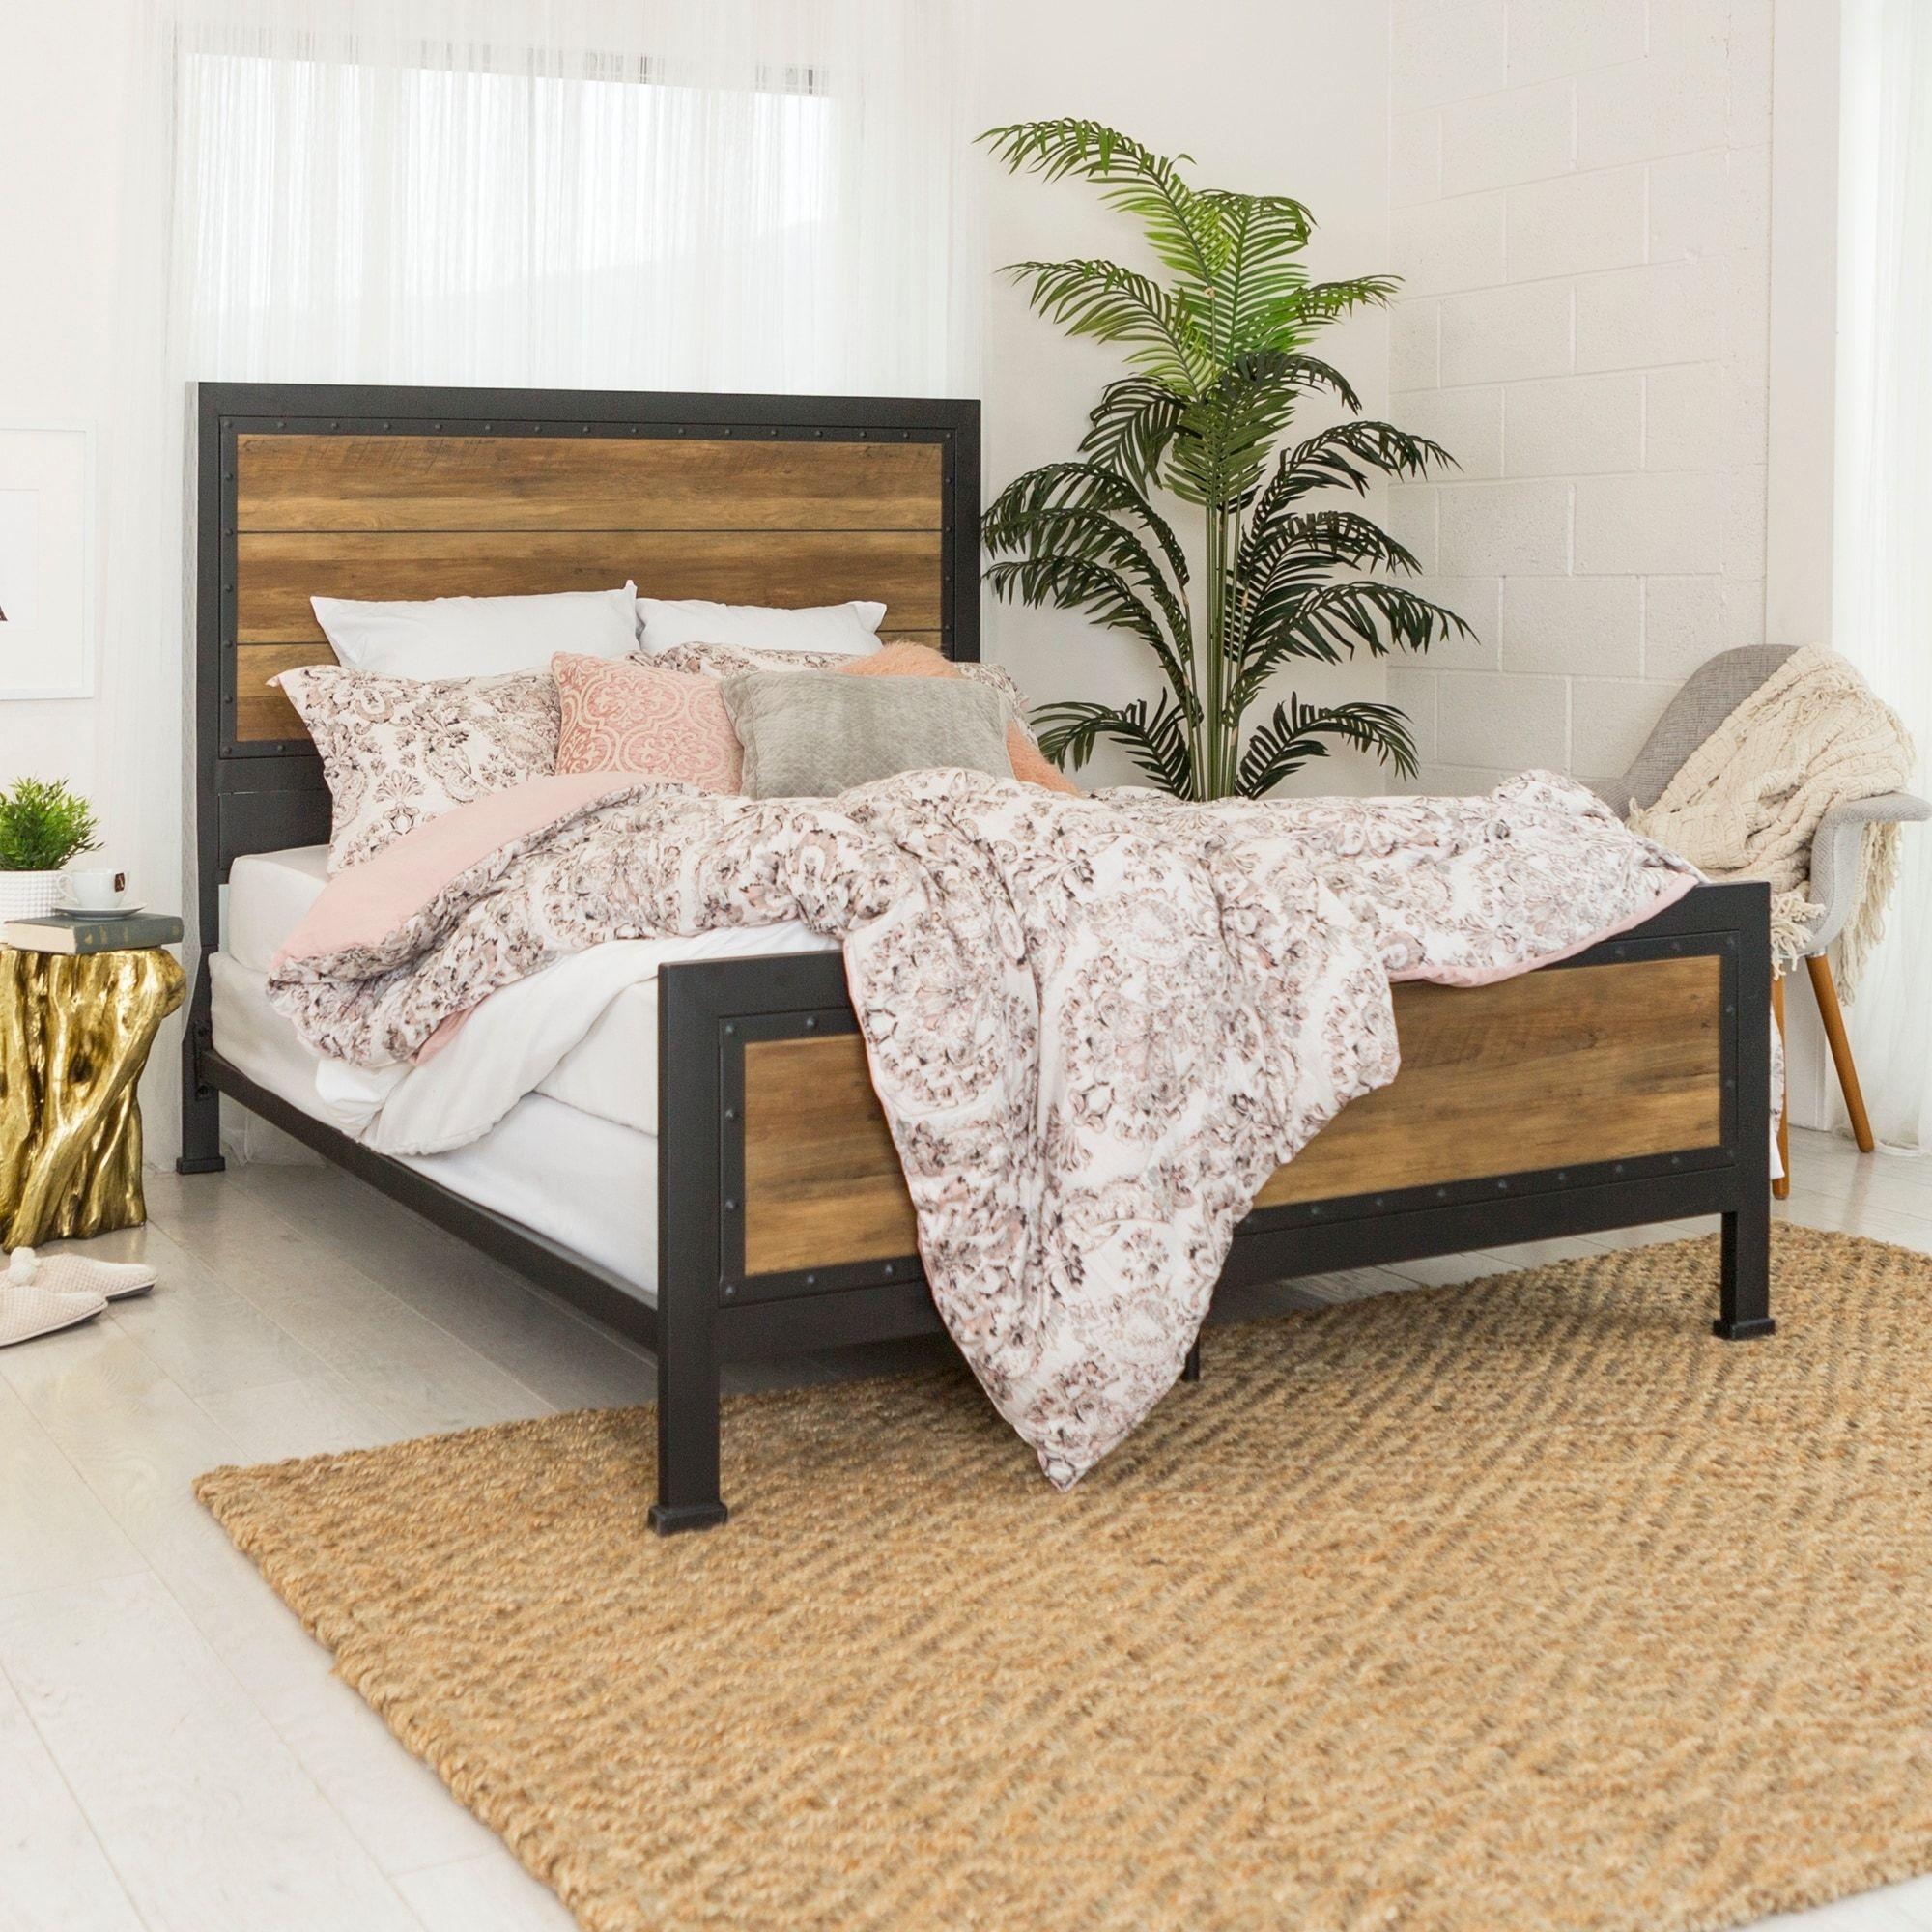 Carbon (Black) Loft Santos Industrial Wood And Metal Queen Bed